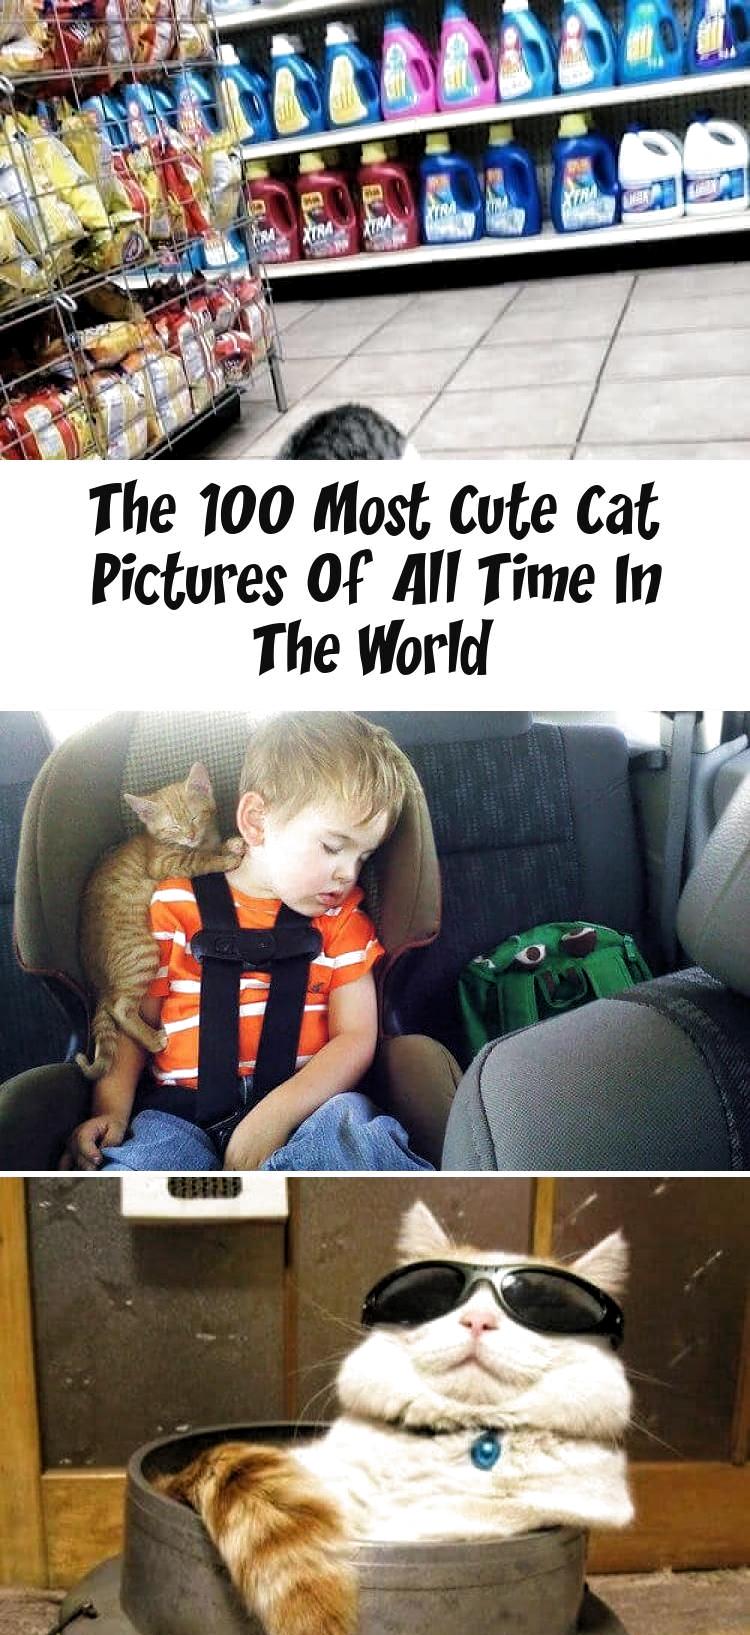 Squeeeee! white kitten licks window - kitty memes cat humor funny joke gato chat